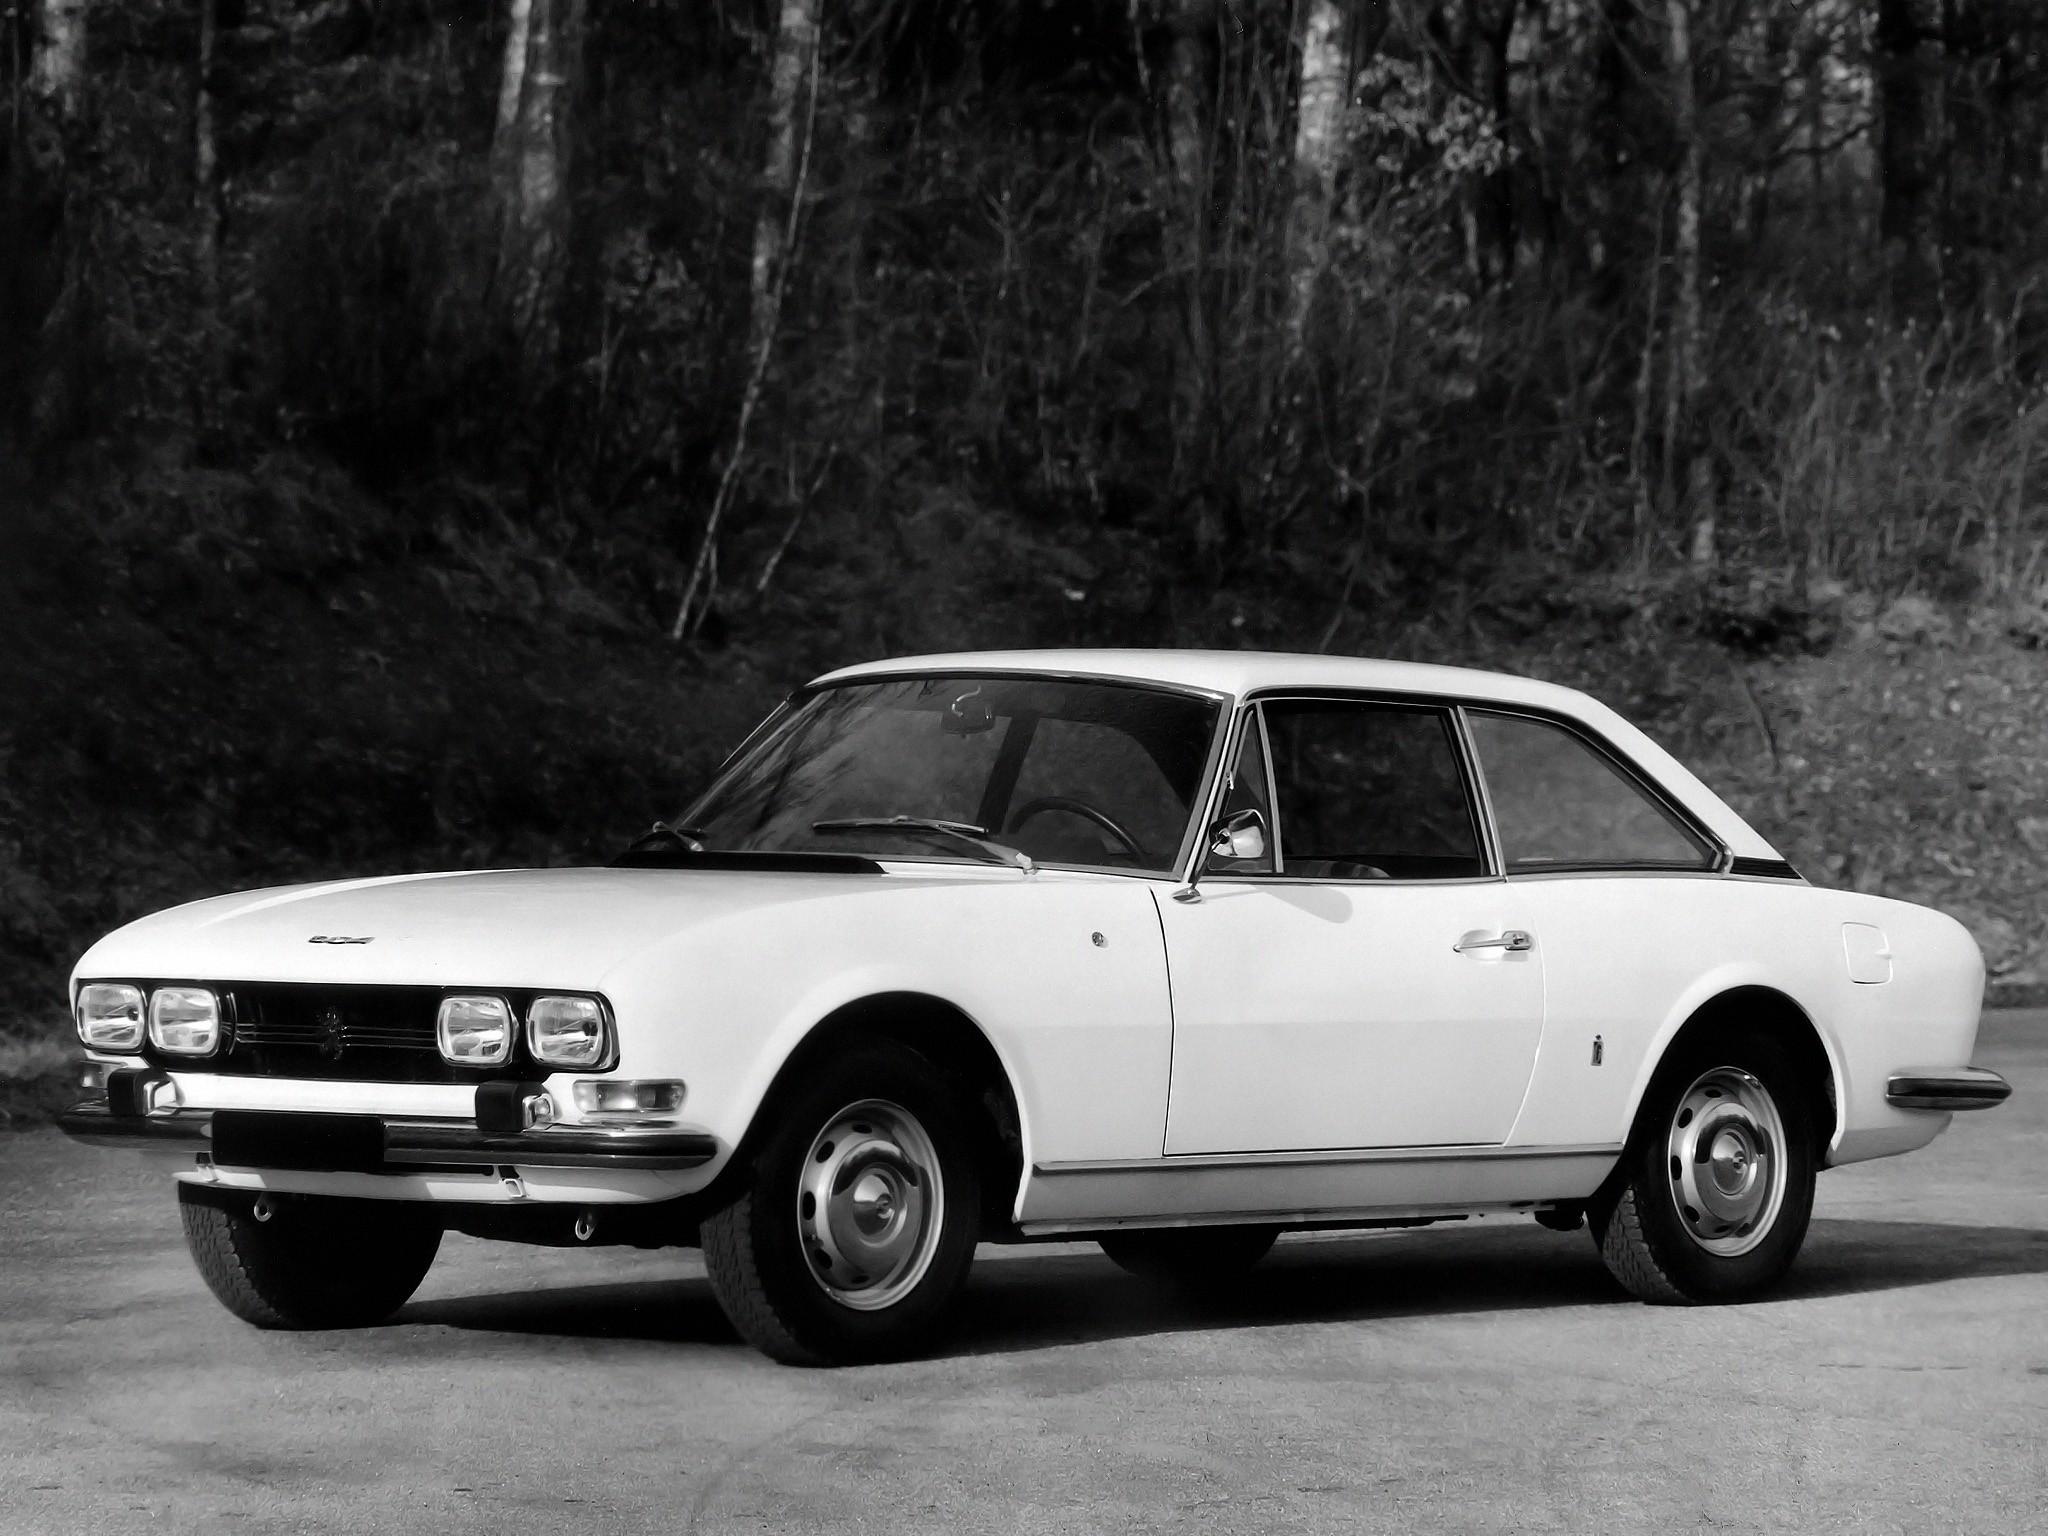 Car Engines For Sale >> PEUGEOT 504 Coupe specs & photos - 1974, 1975, 1976, 1977, 1978, 1979, 1980, 1981, 1982 ...